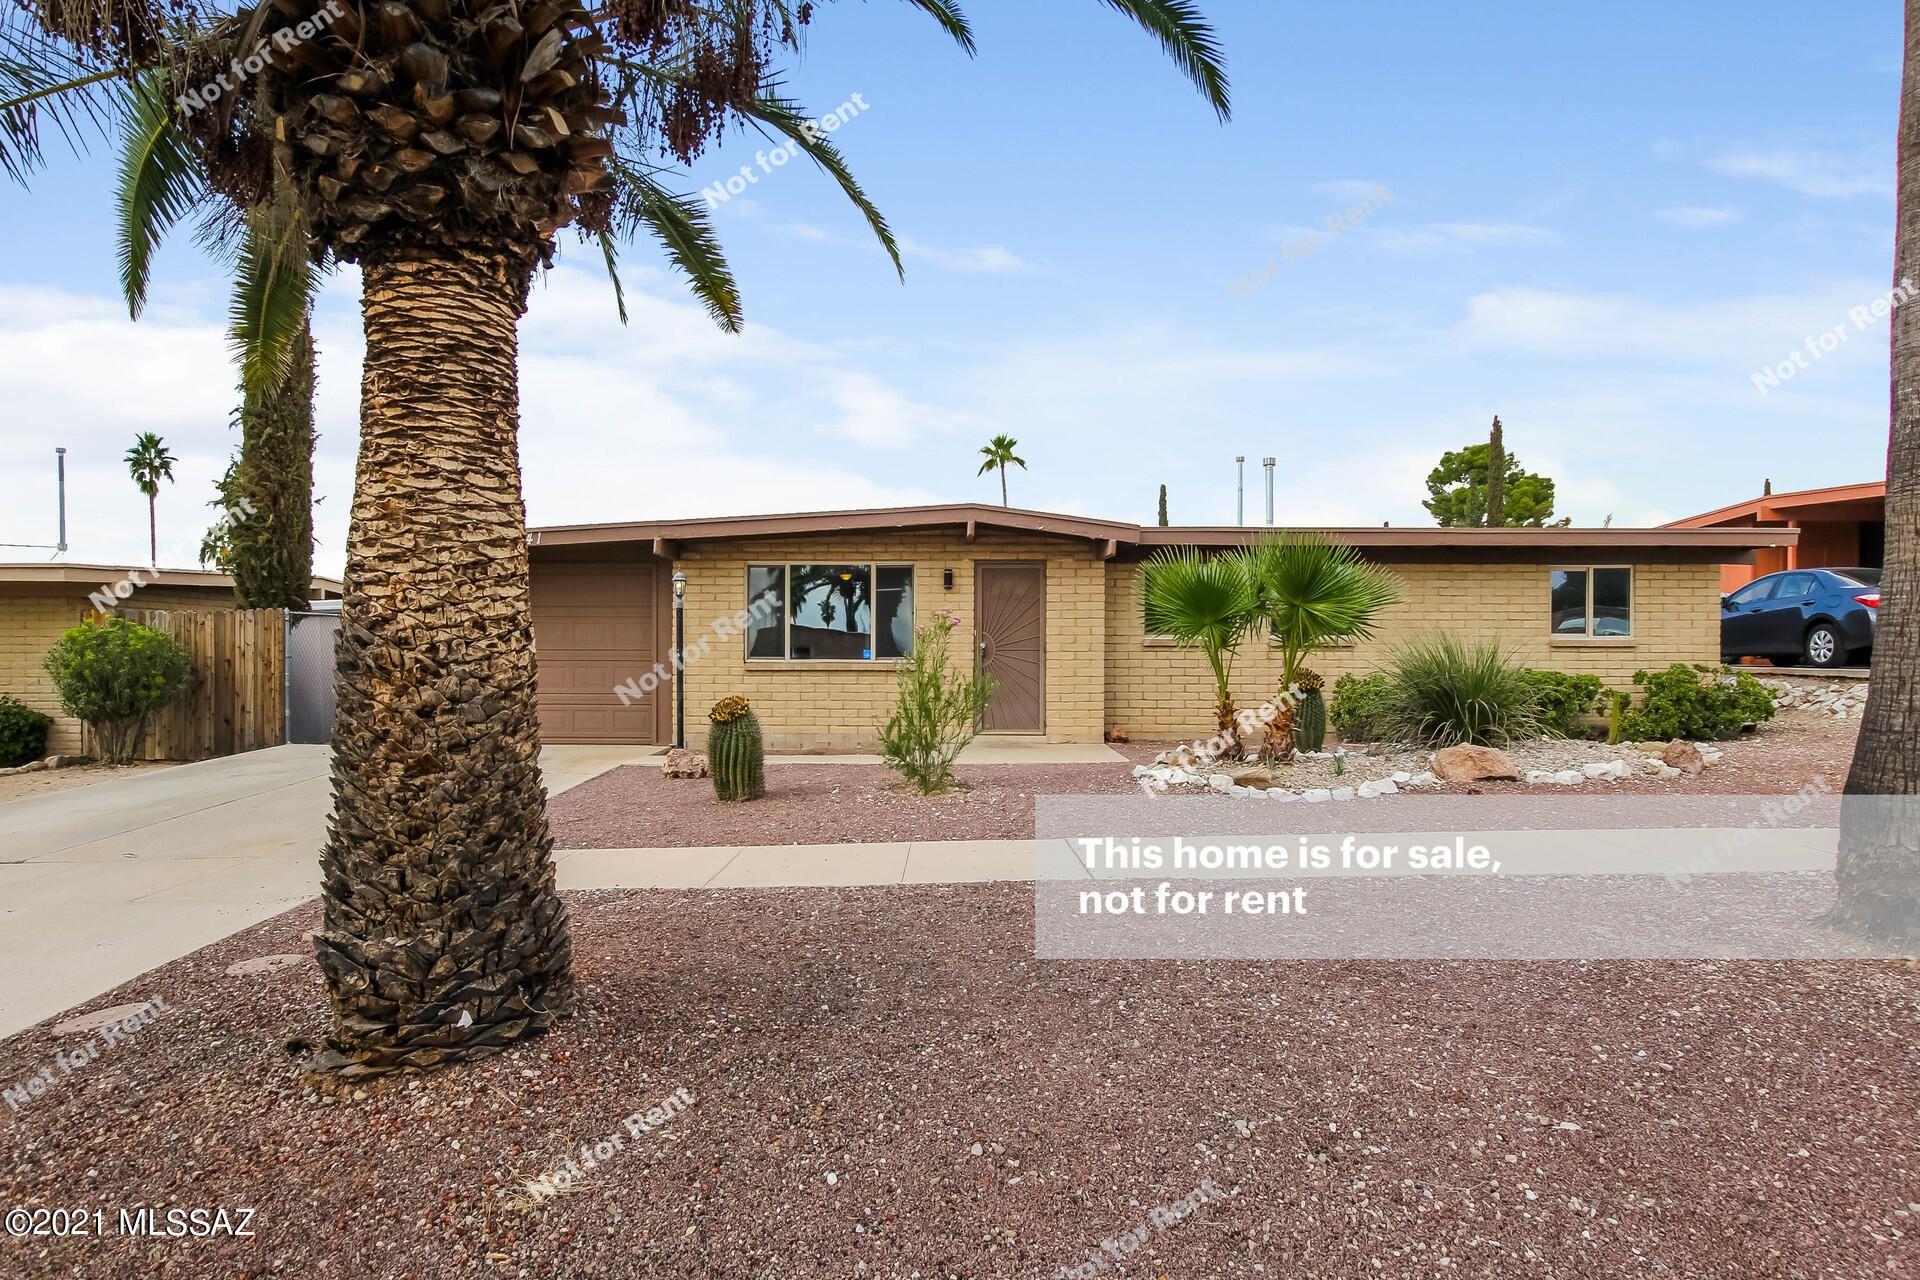 9341 E 29Th Street, Tucson, AZ 85710 - MLS#: 22124258